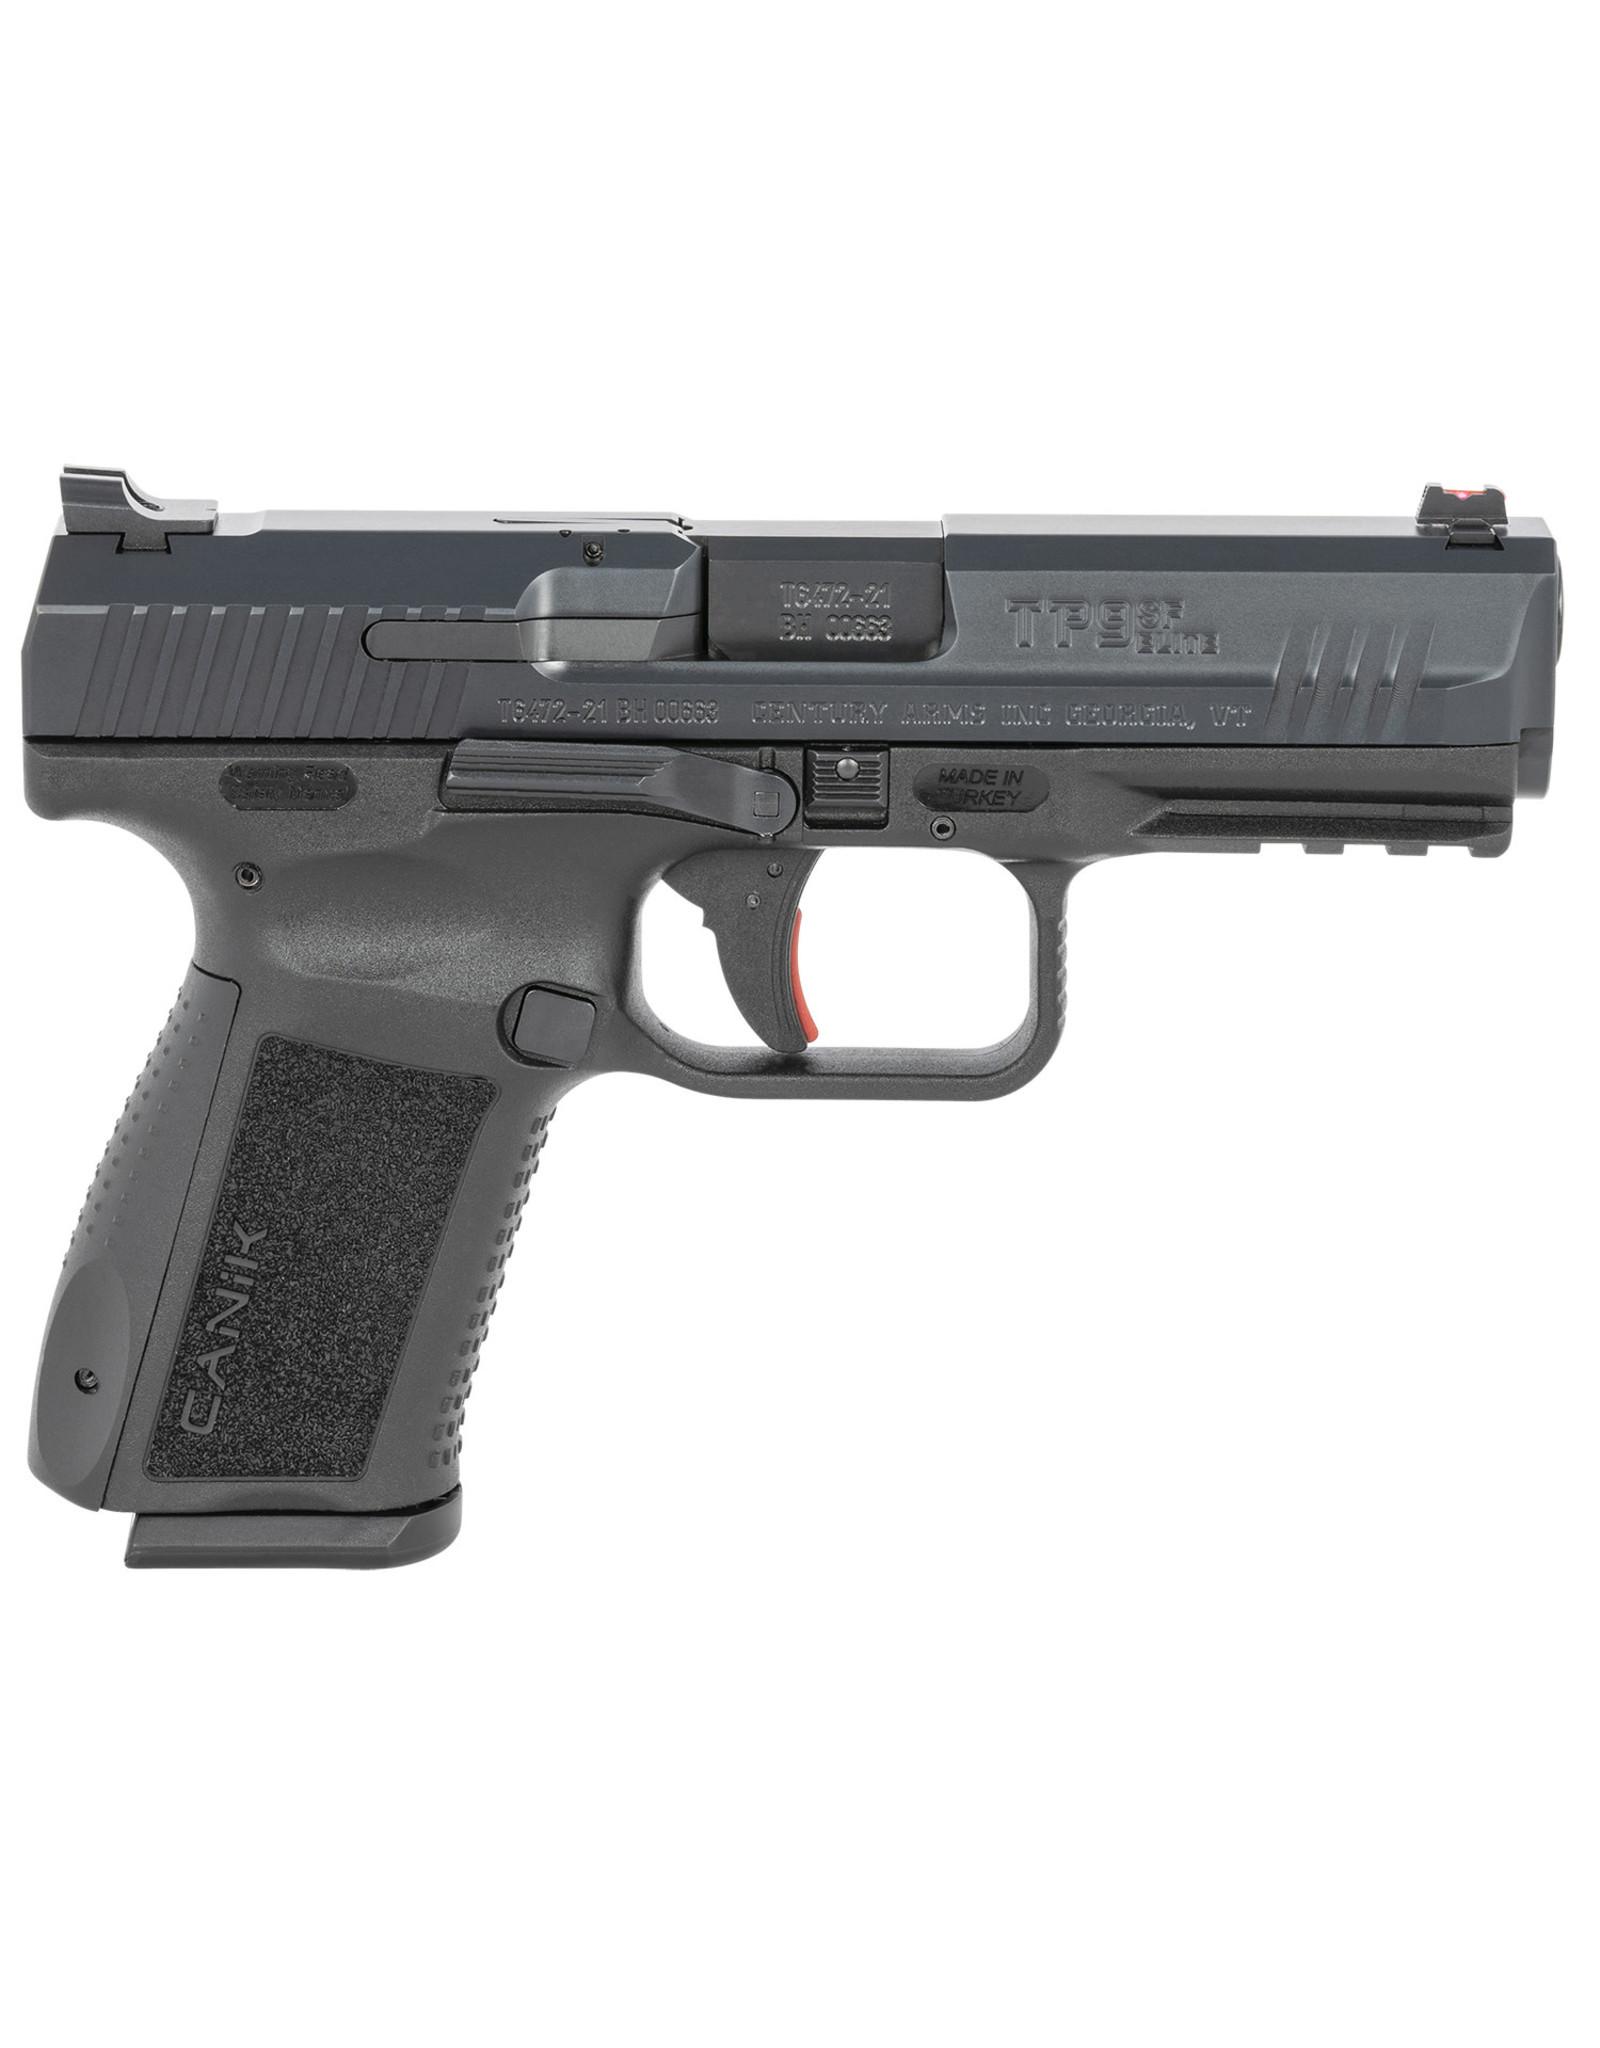 "Canki TP9SF Elite 9mm 4.19"" 10+1 Round"